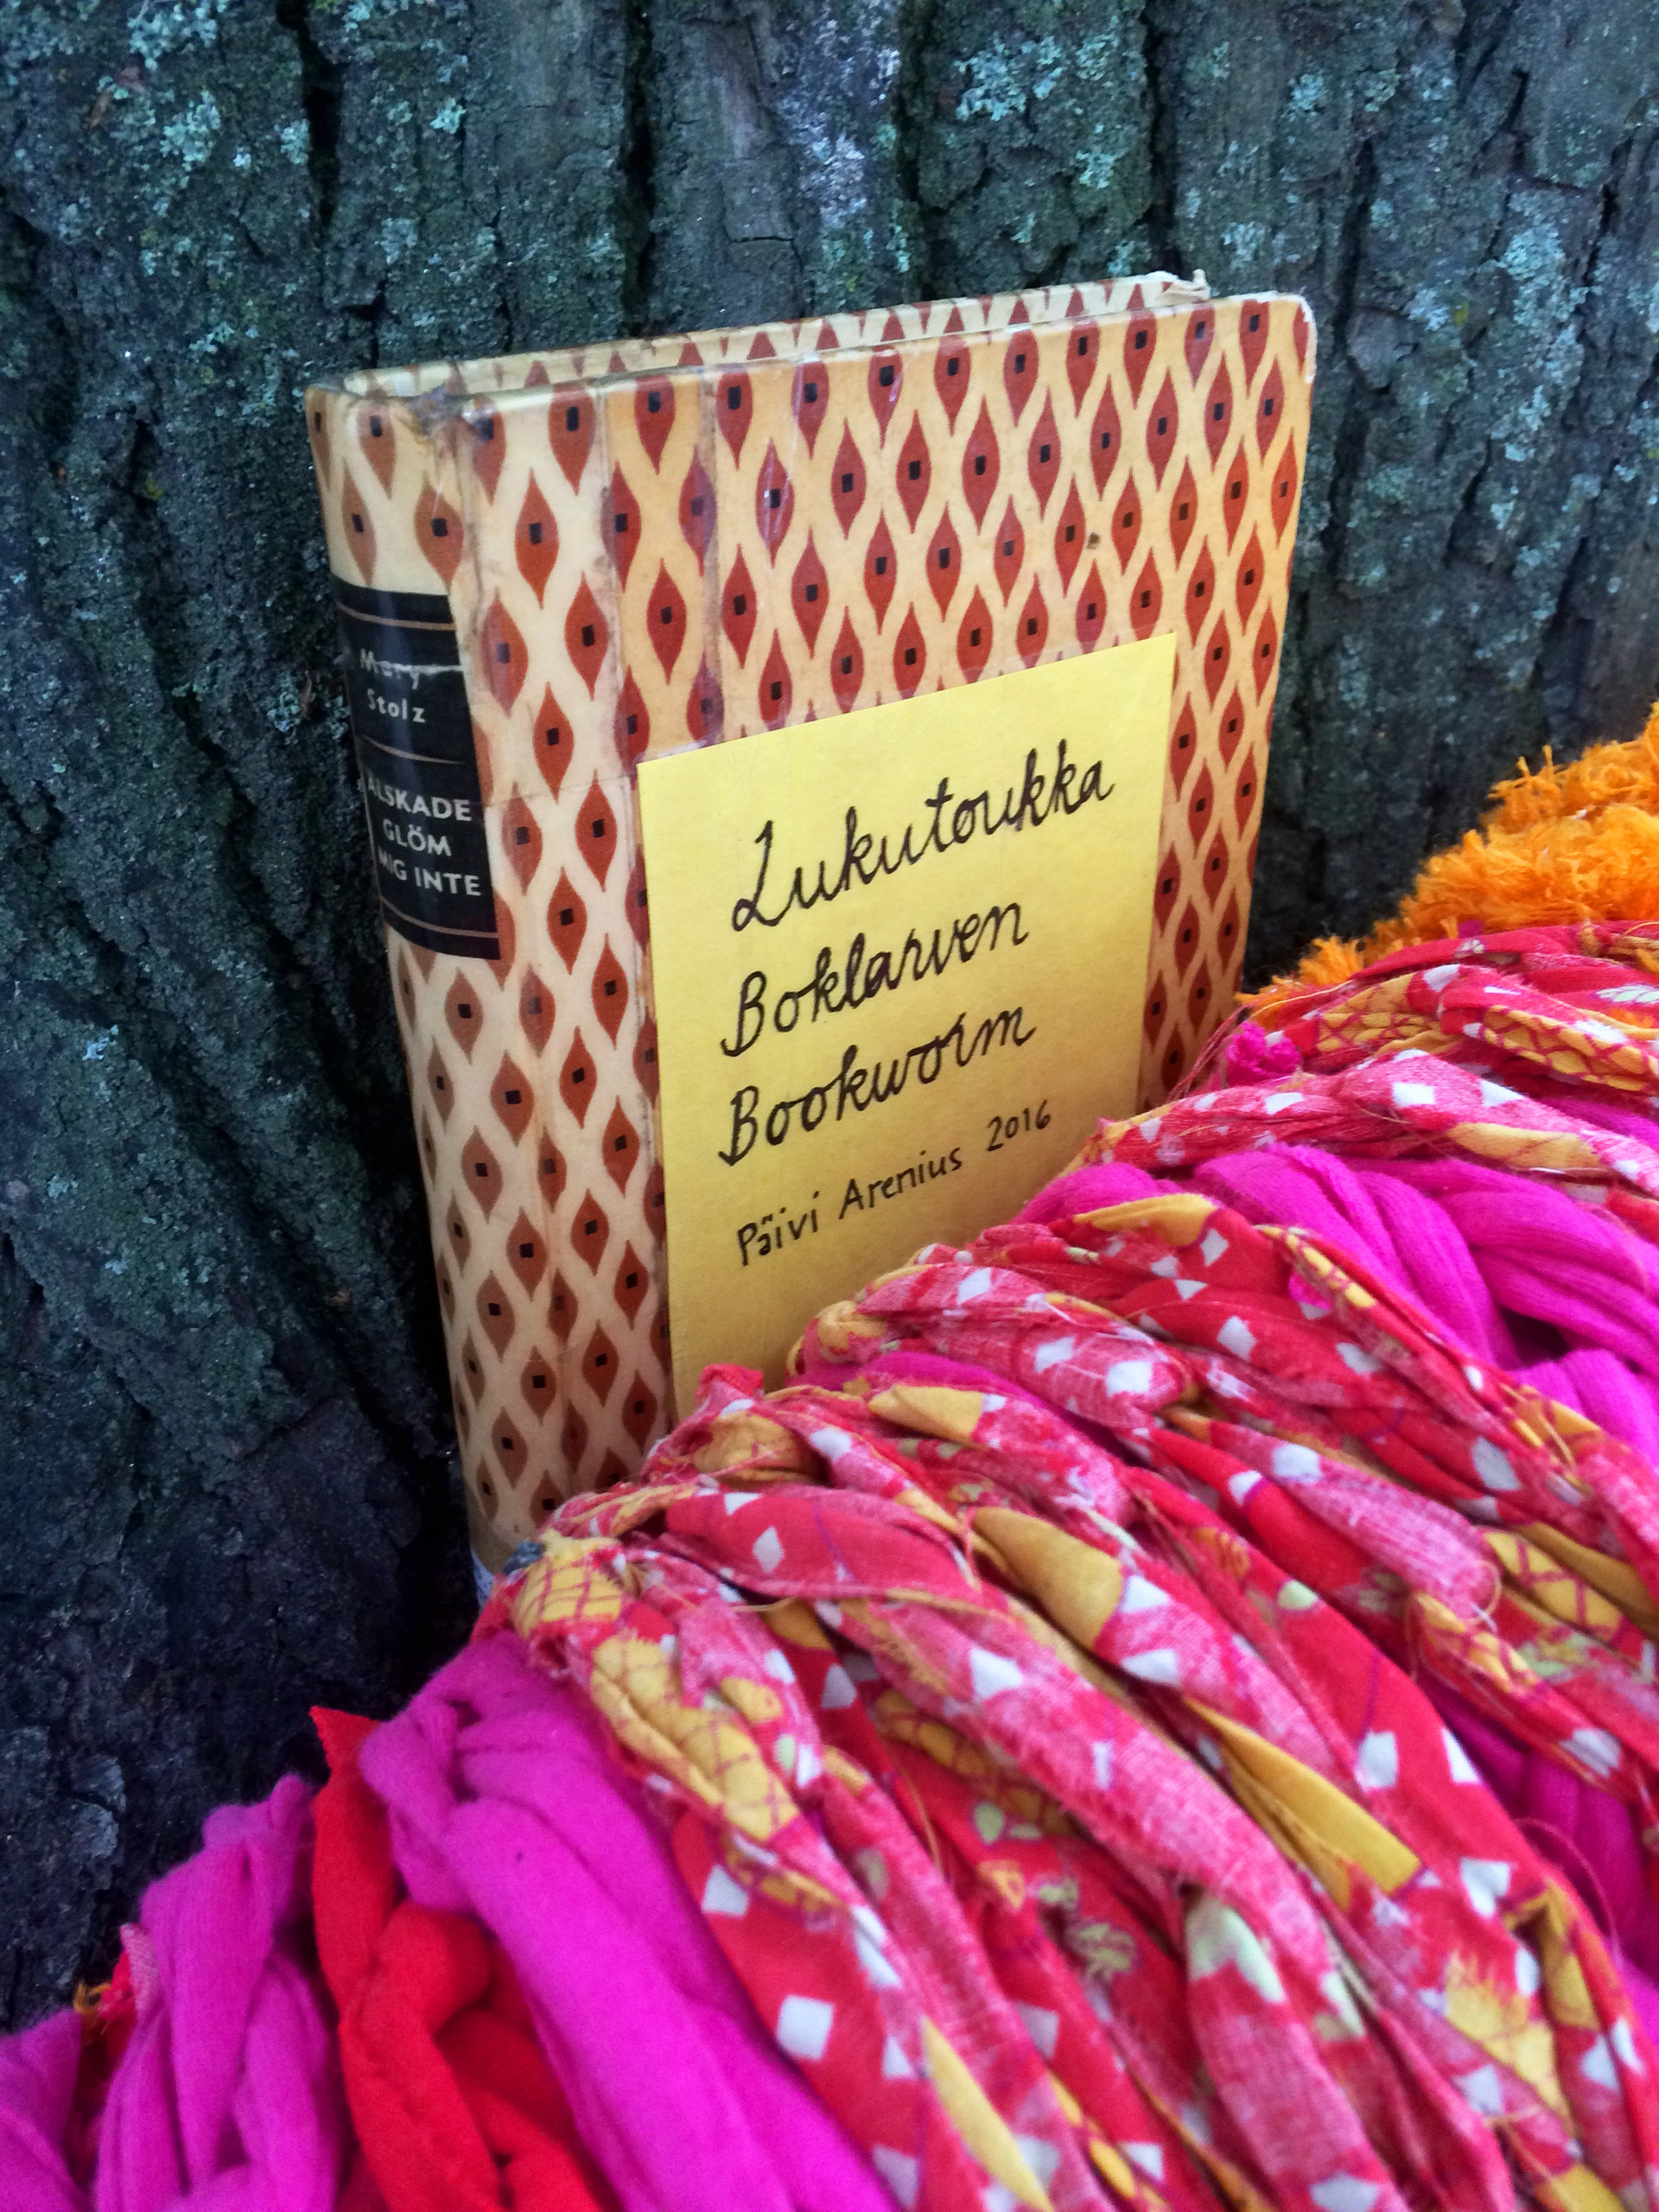 Lukutoukka – Bookworm, Night of Arts happening Vaasa, Vaasa City Library, 2016